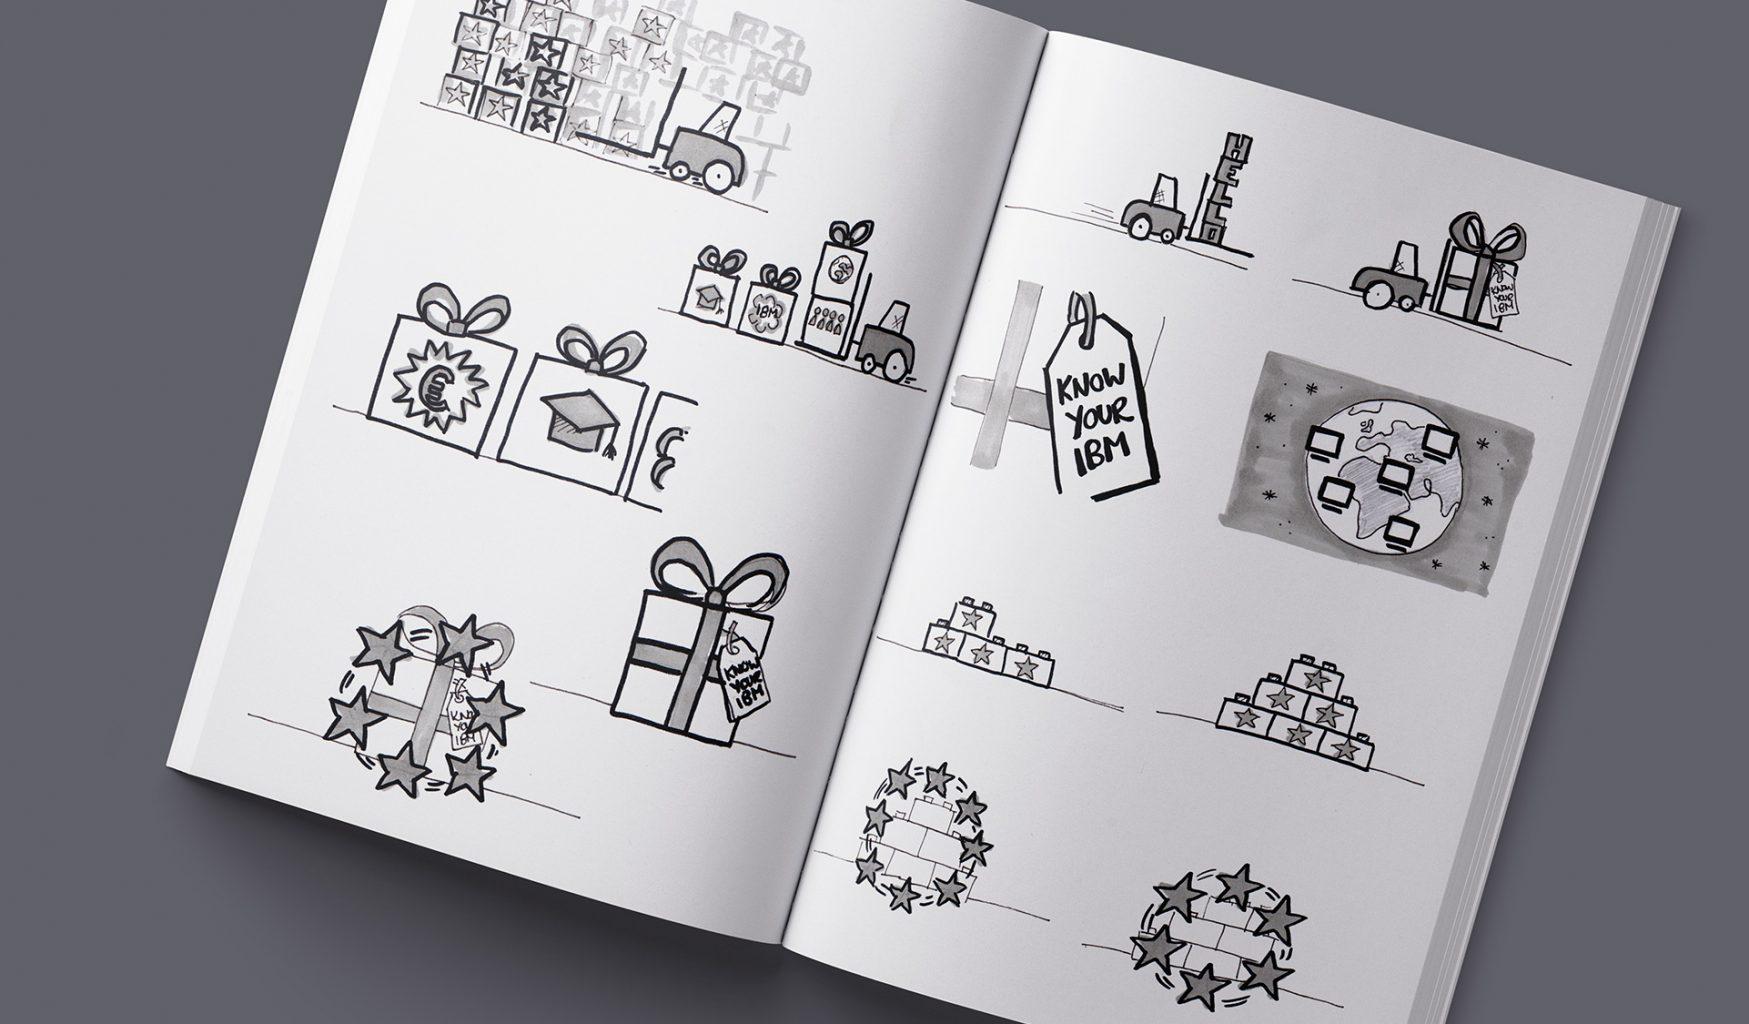 KYI IBM Sketches